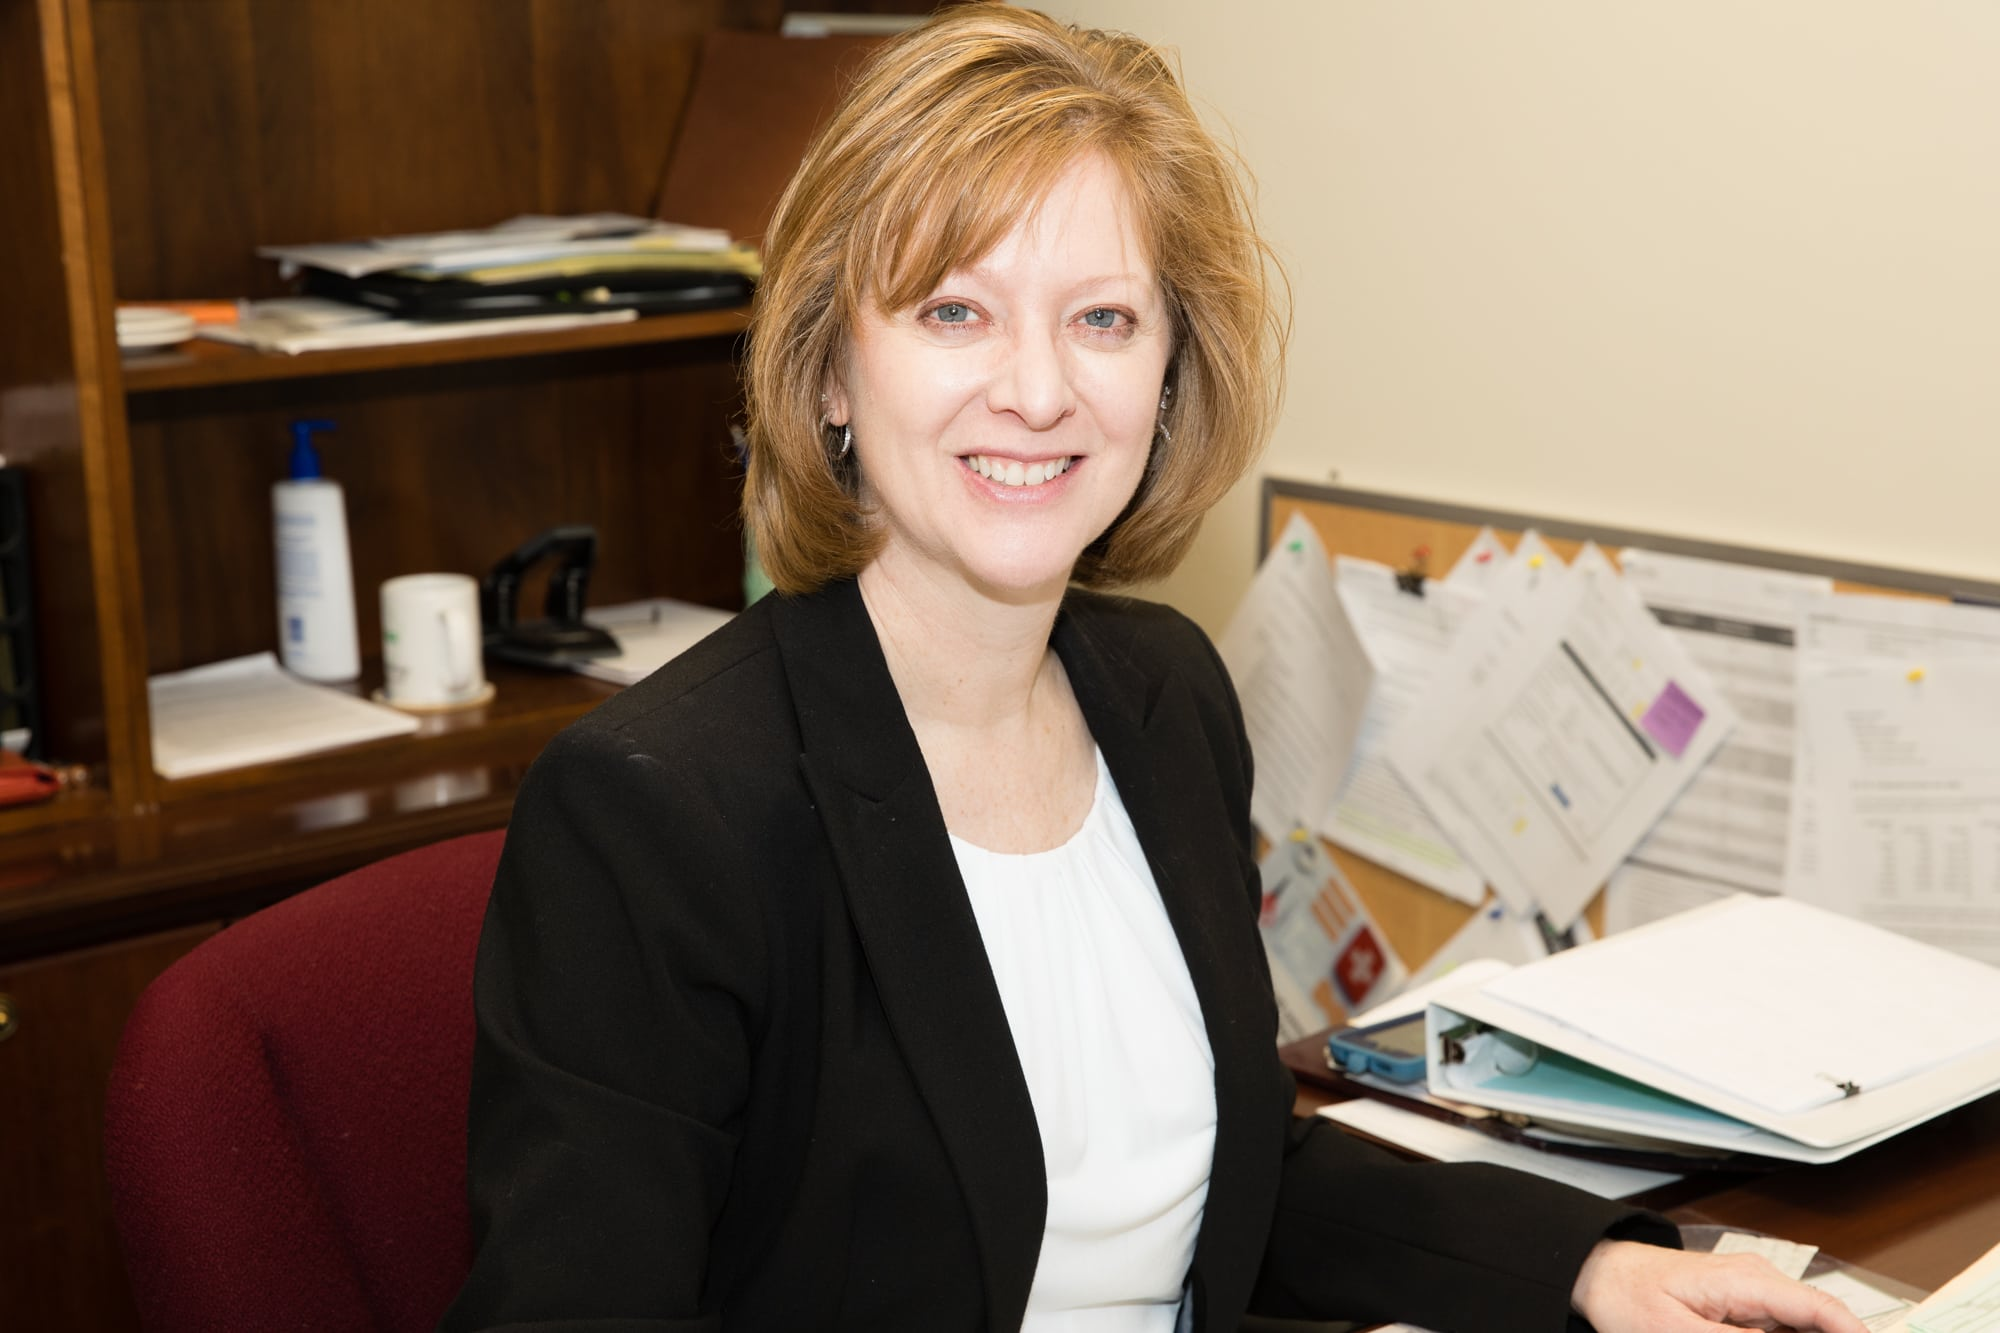 Sandra K. Guthrie, CPA, CFE - Partner